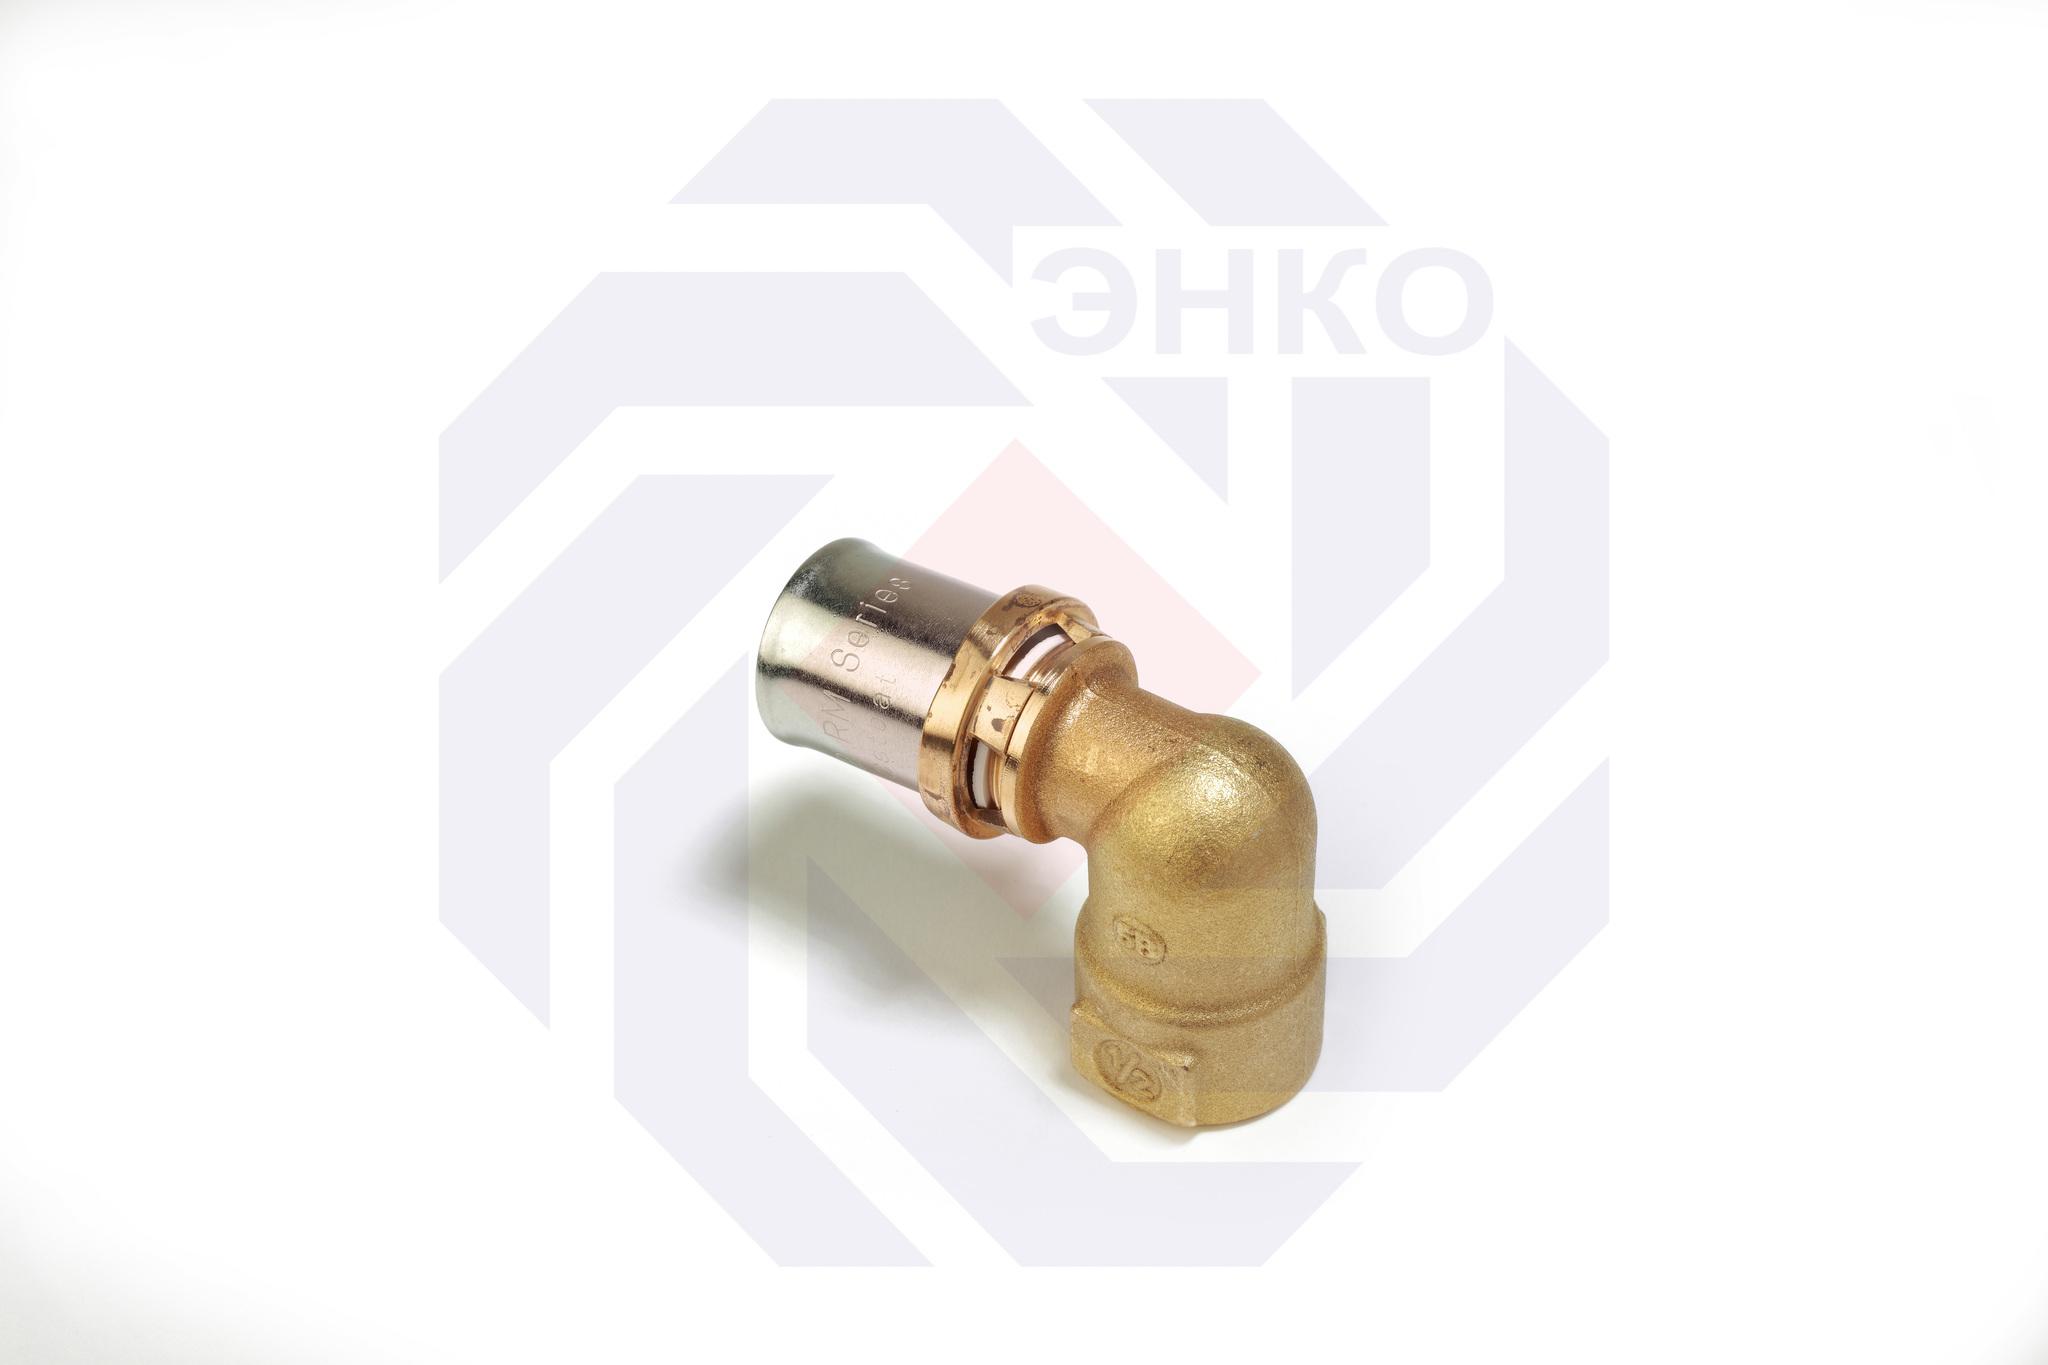 Пресс-фитинг отвод 90° ВР GIACOMINI RM 40⨯1¼